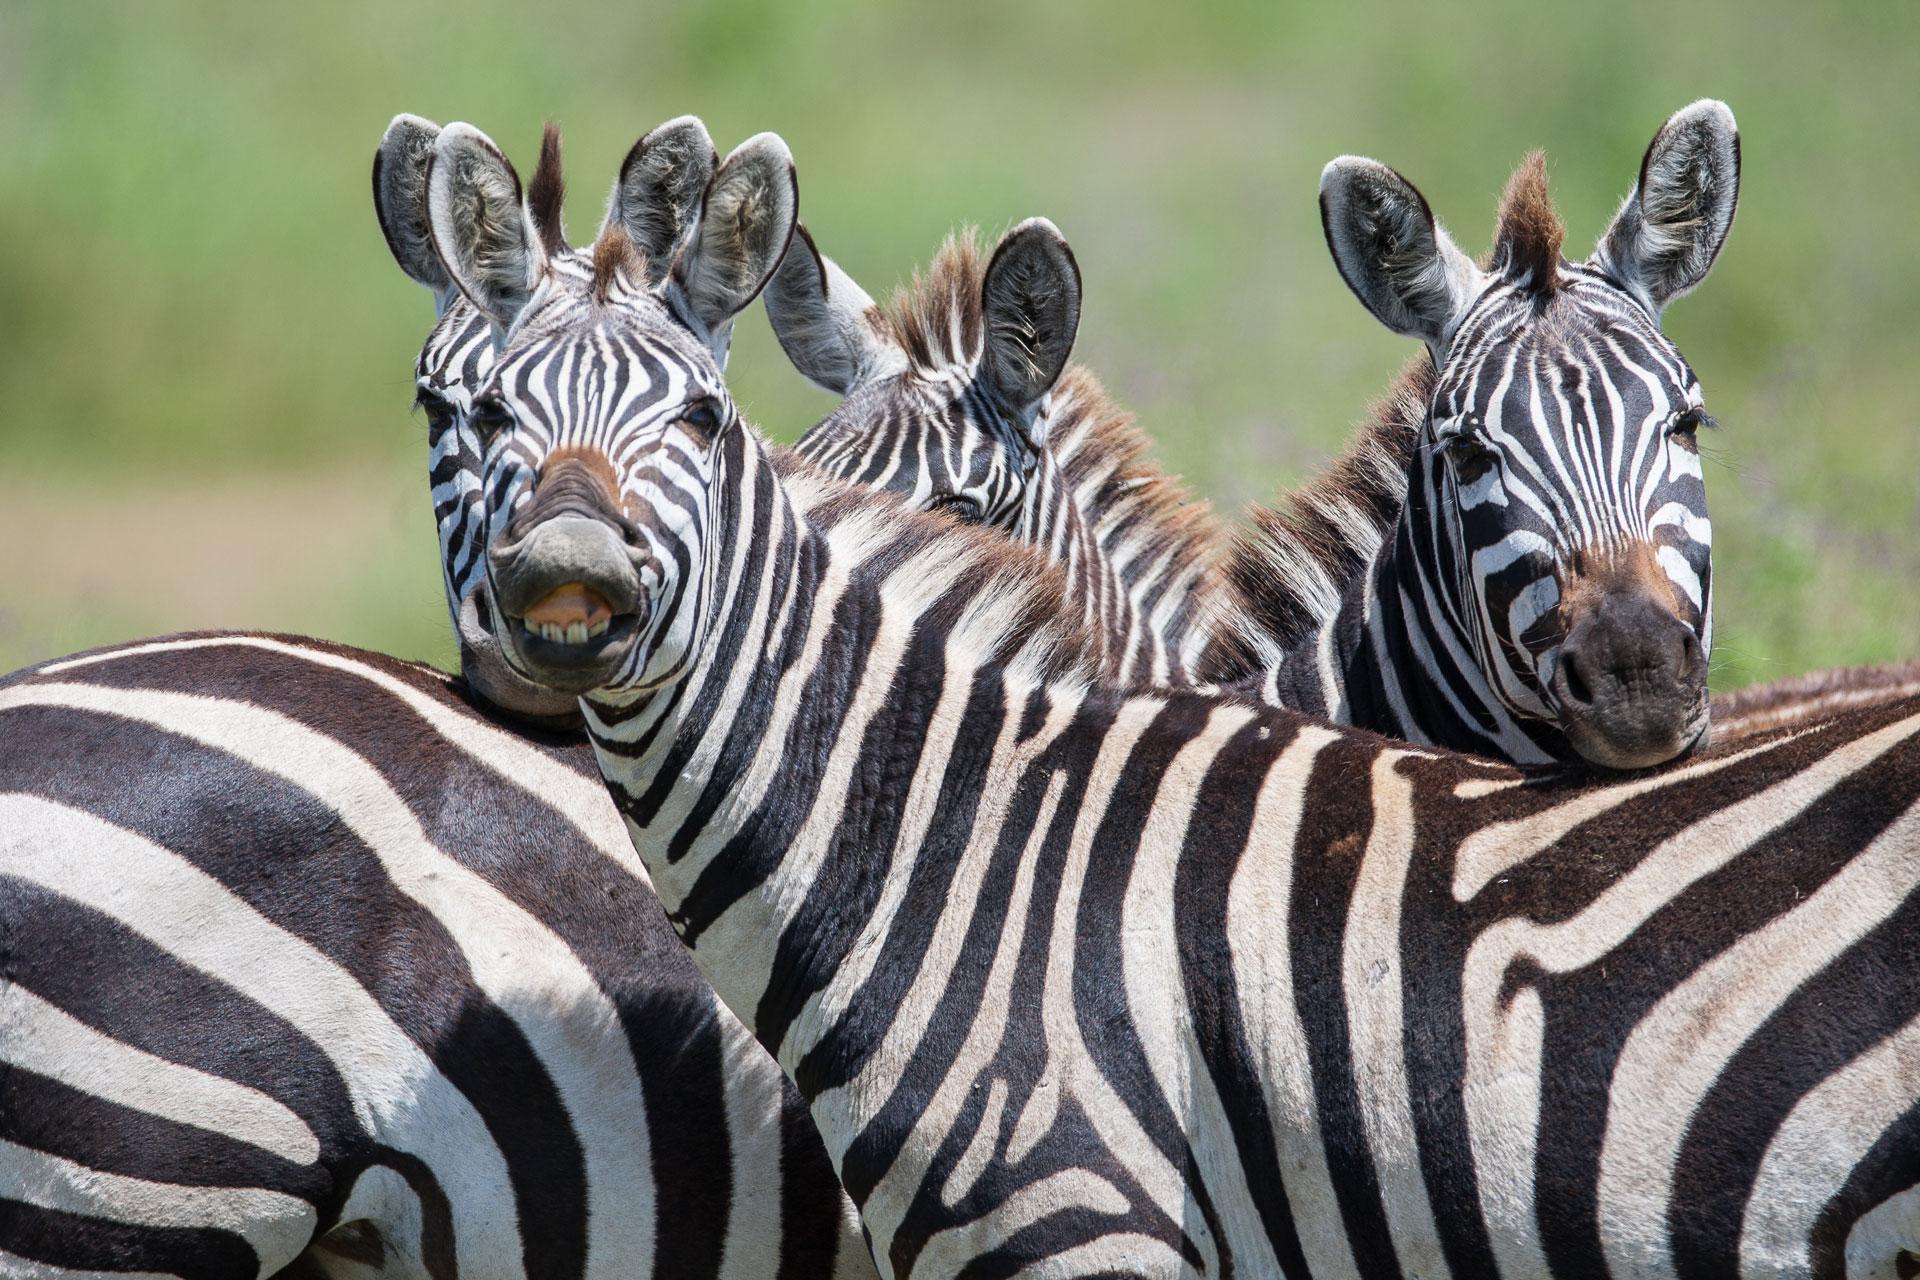 Herd of zebras at Ruaha National Park, Tanzania